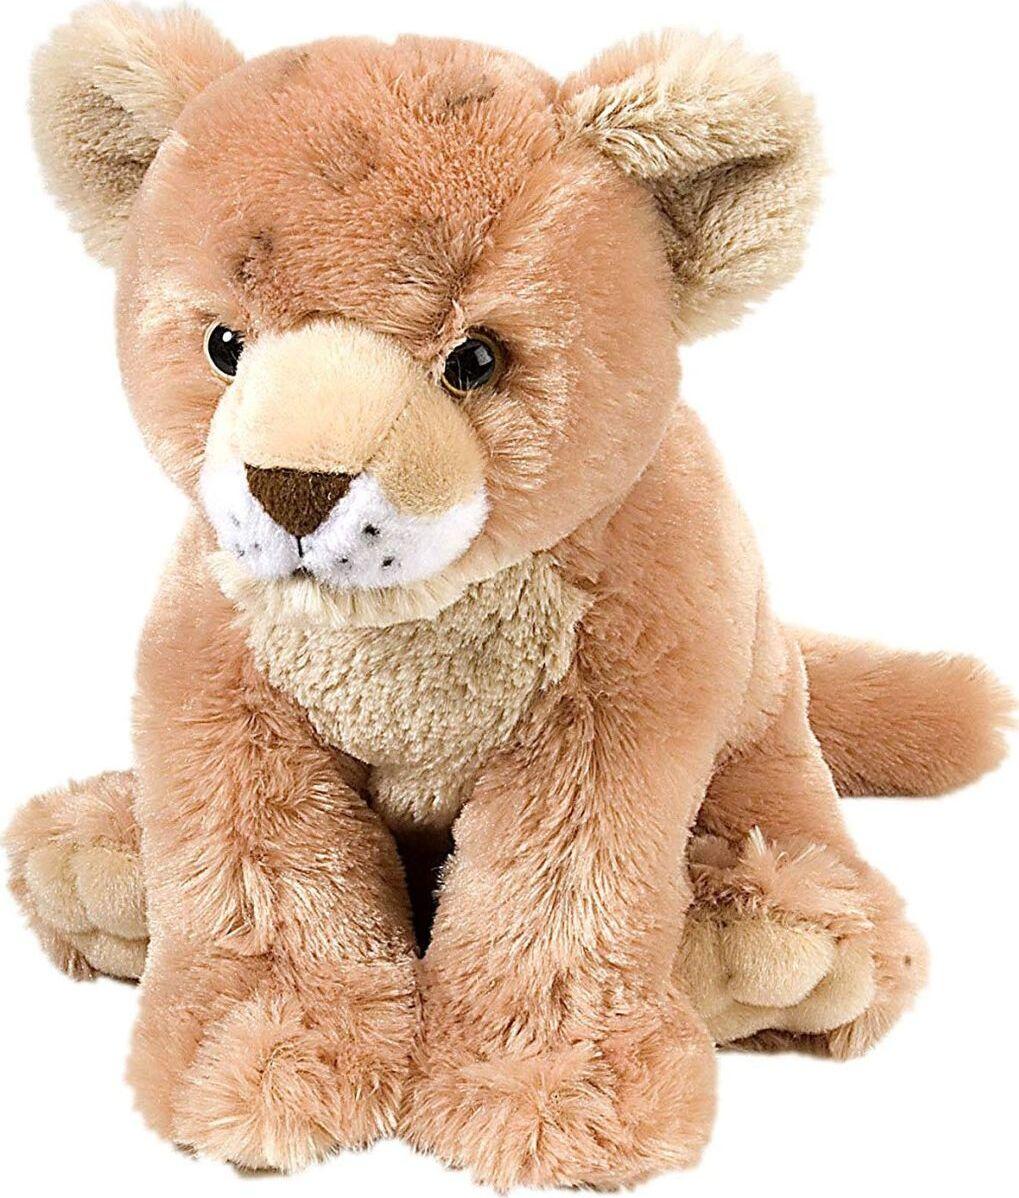 игрушка львенок картинки гекс